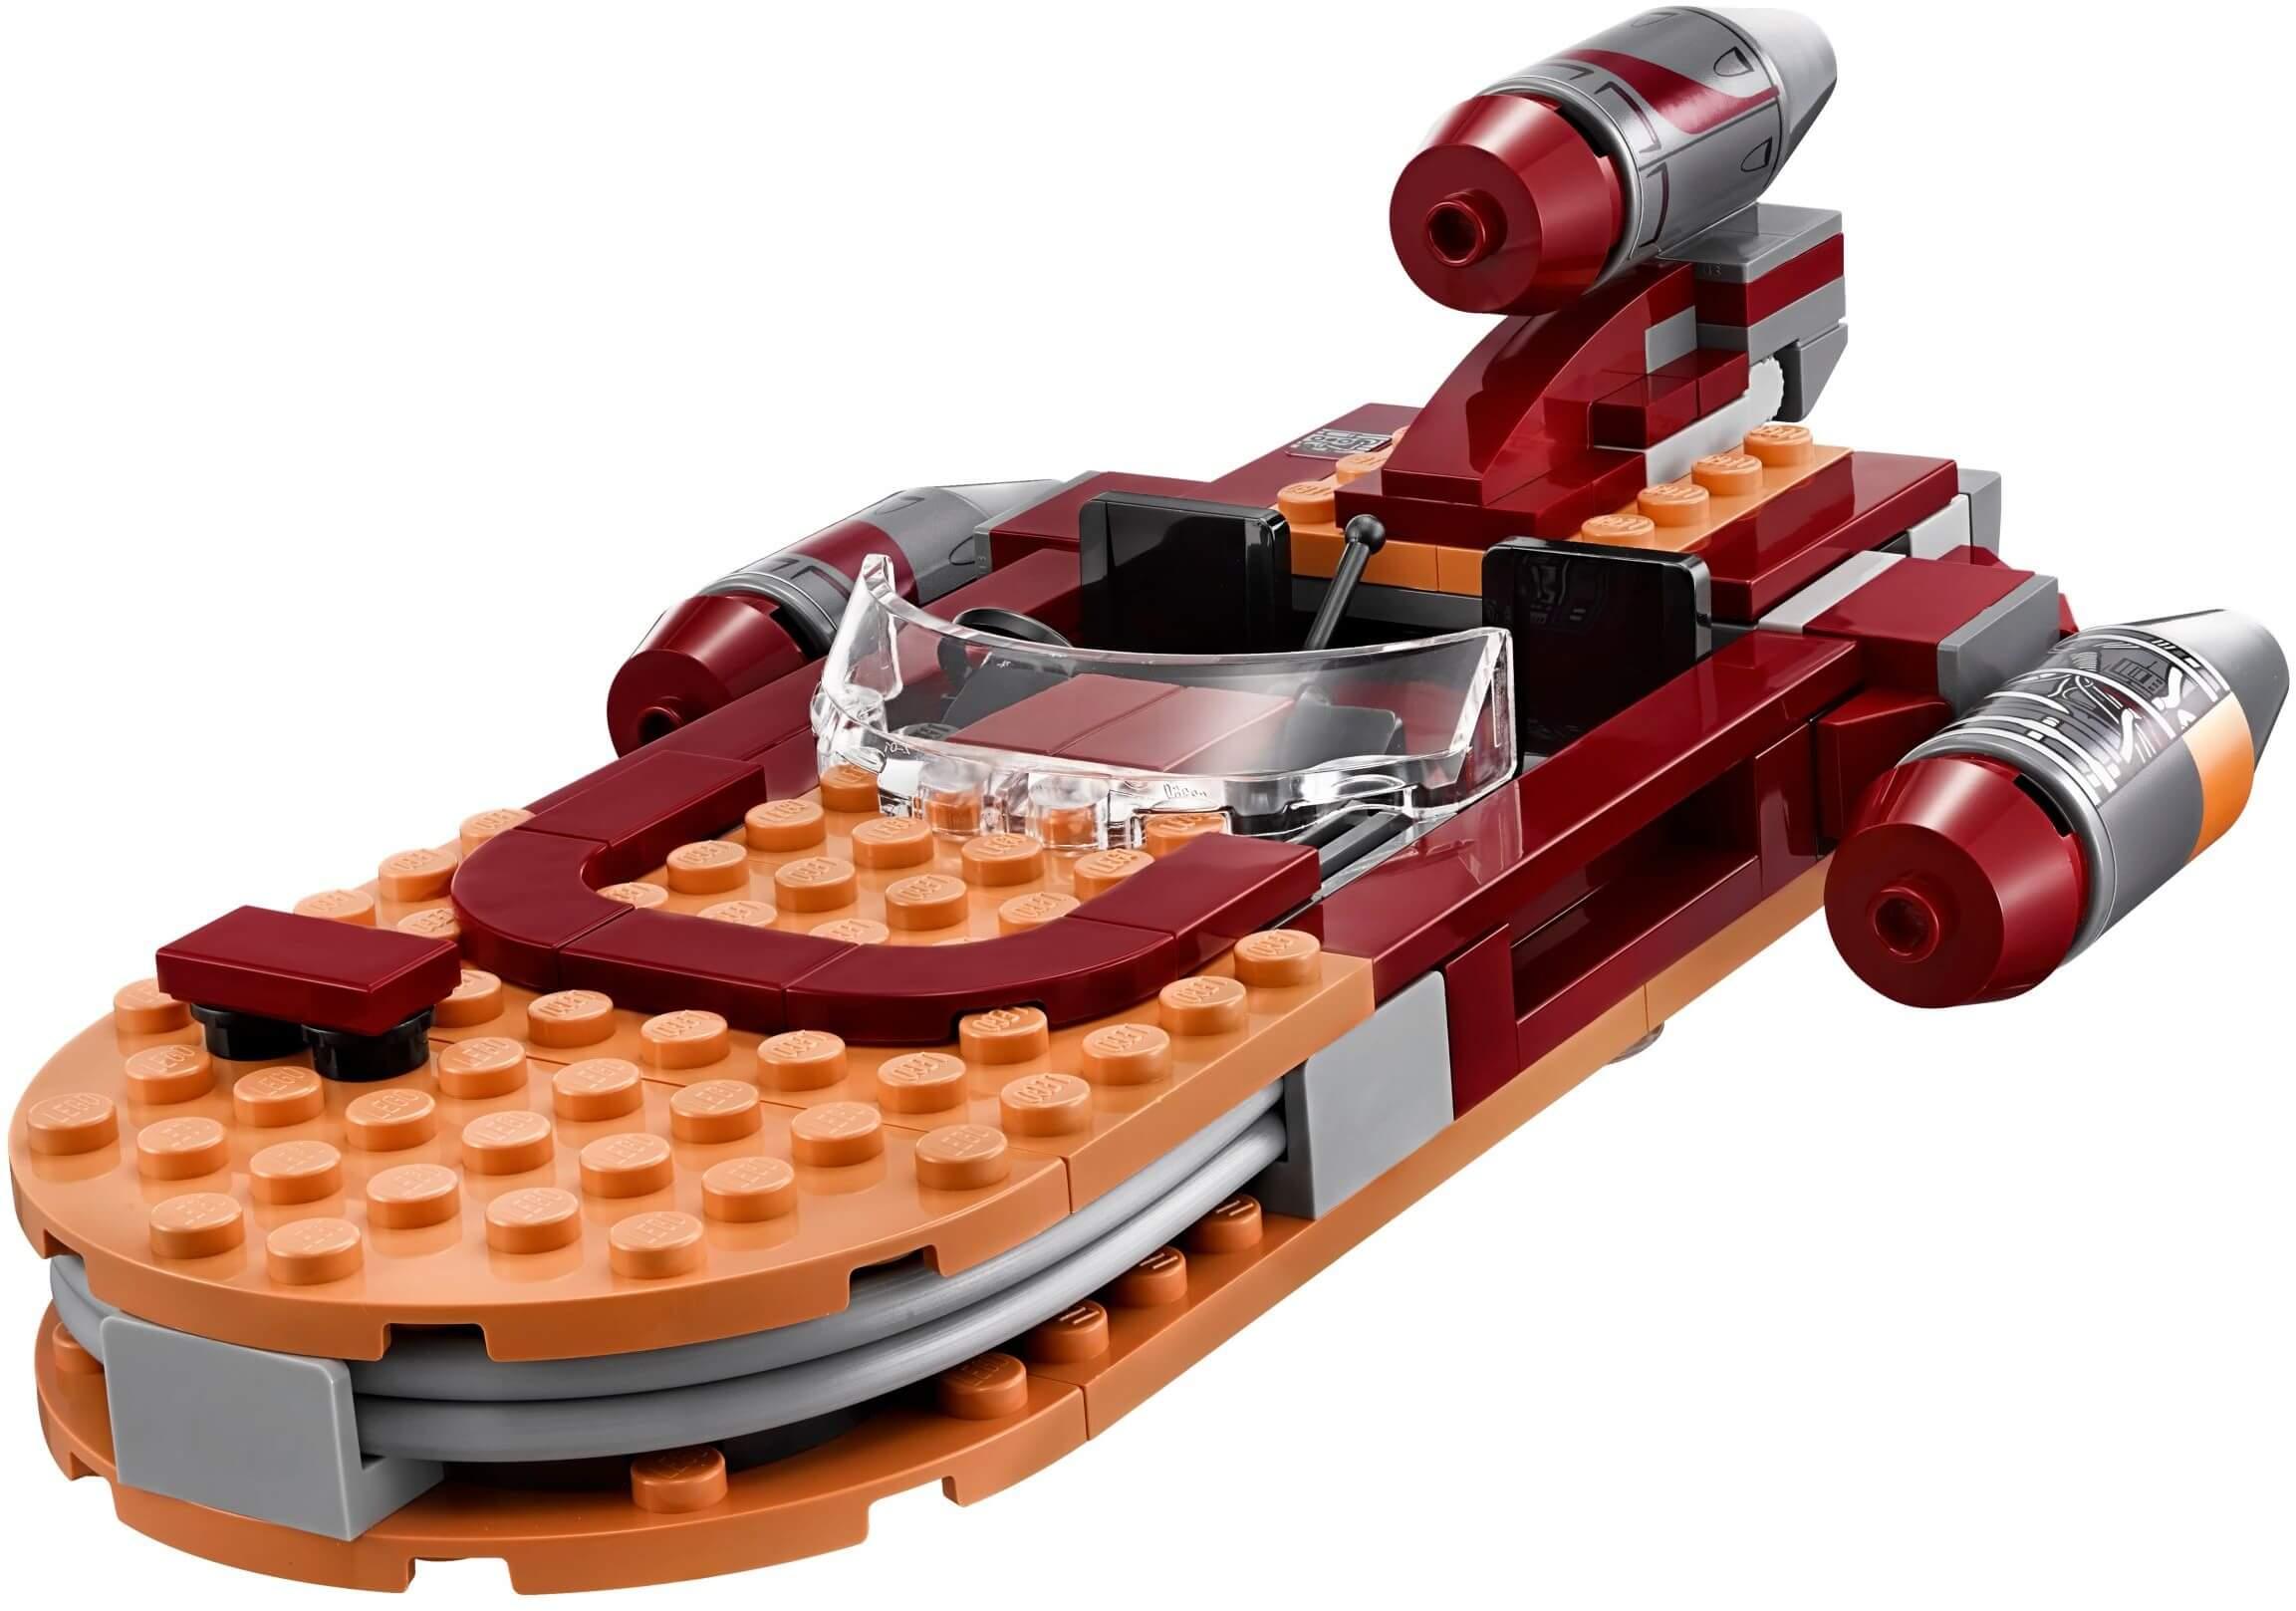 Mua đồ chơi LEGO 75173 - LEGO Star Wars 75173 - Xe Phản Lực Siêu Tốc của Luke (LEGO 75173 Luke's Landspeeder)